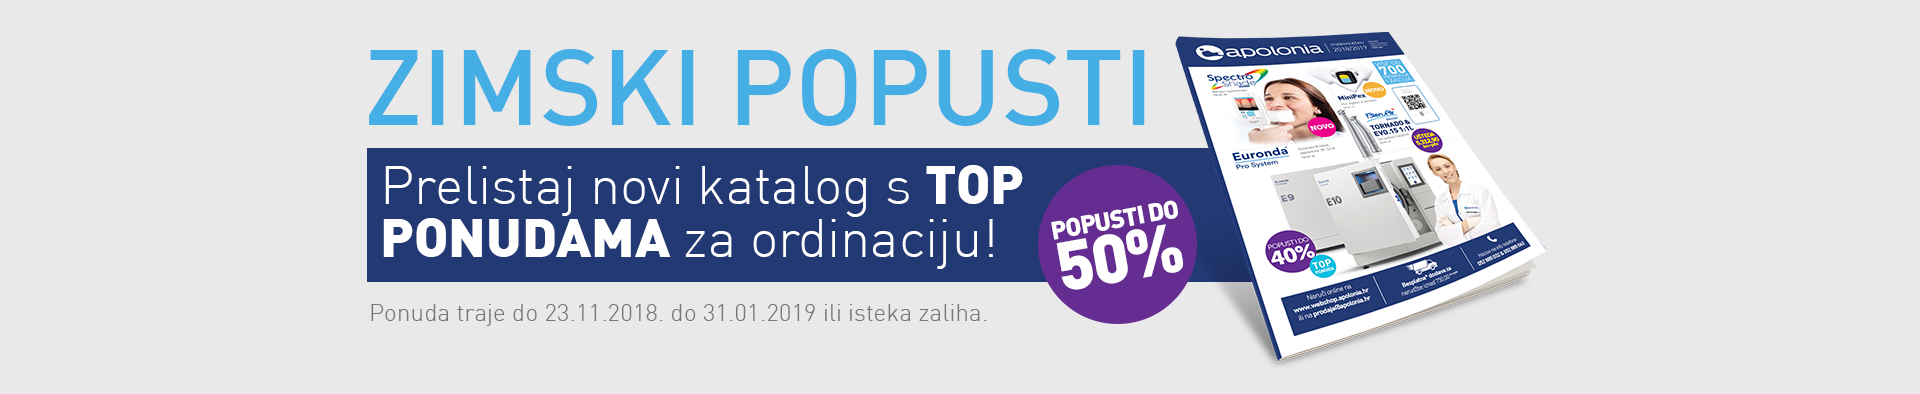 apolonia_katalog-zima-2018-2019